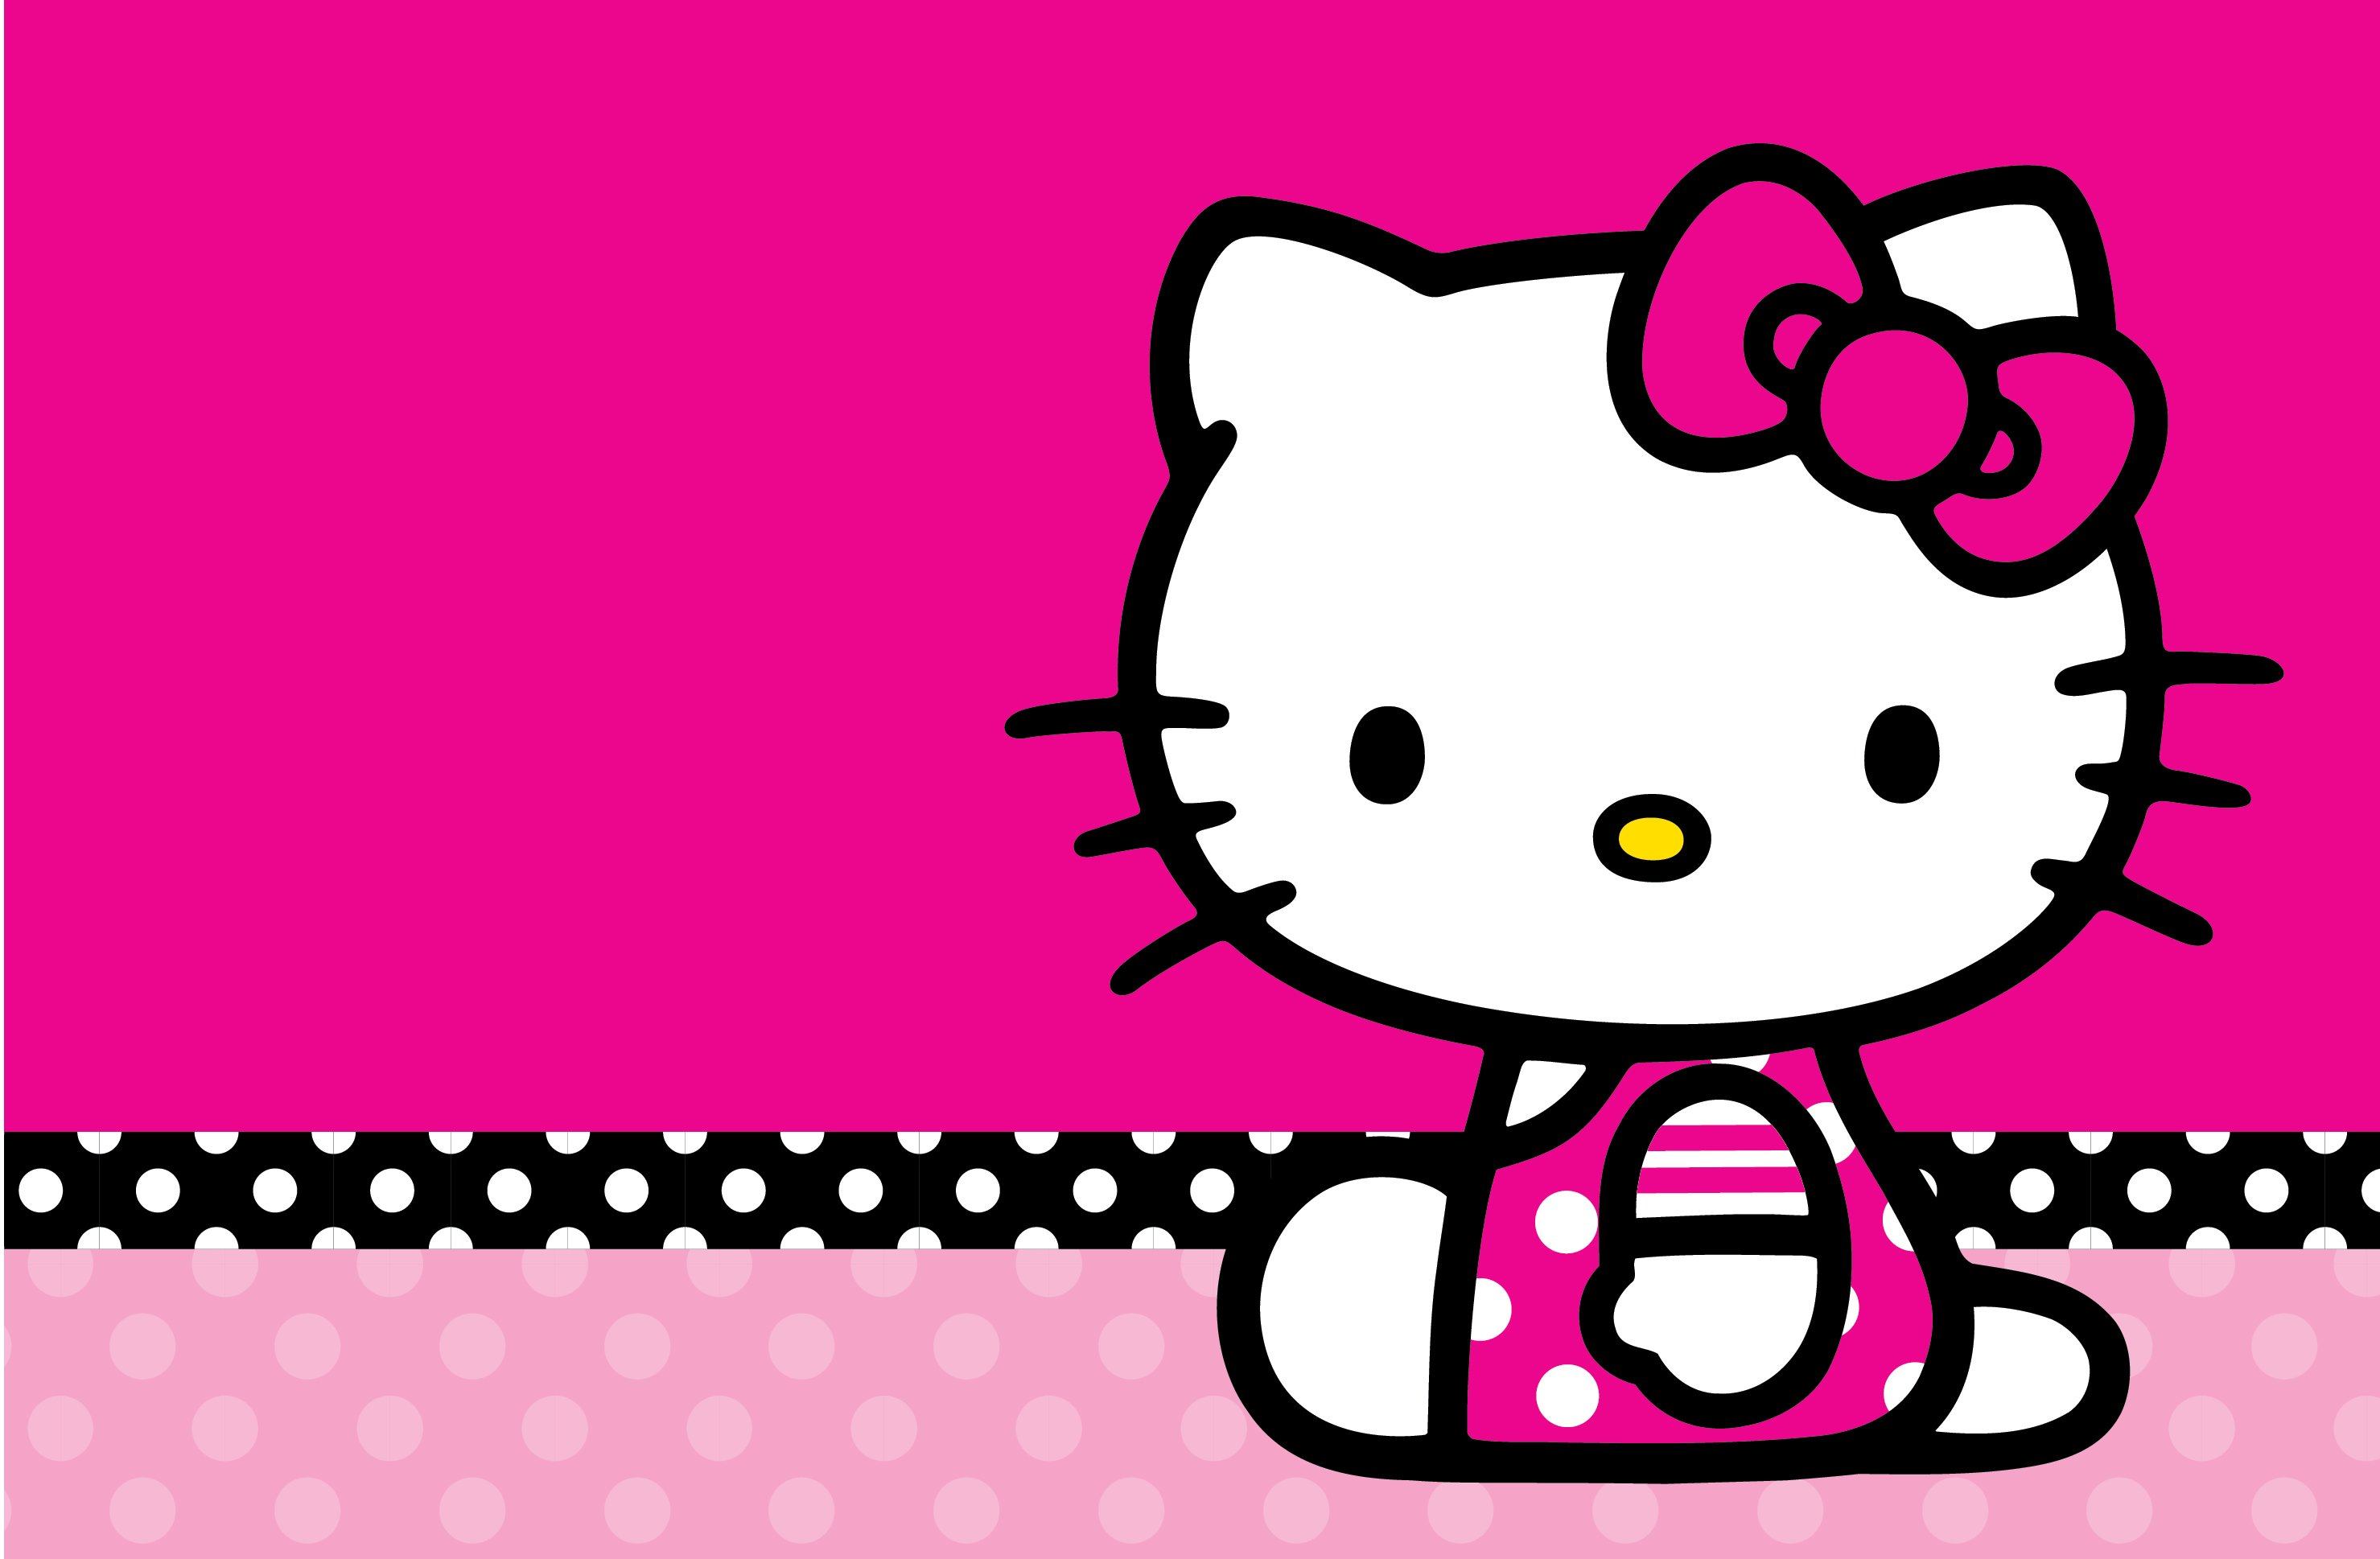 Wallpapers hello kitty vol 22 le coin kawaii - Hello kitty babyzimmer ...